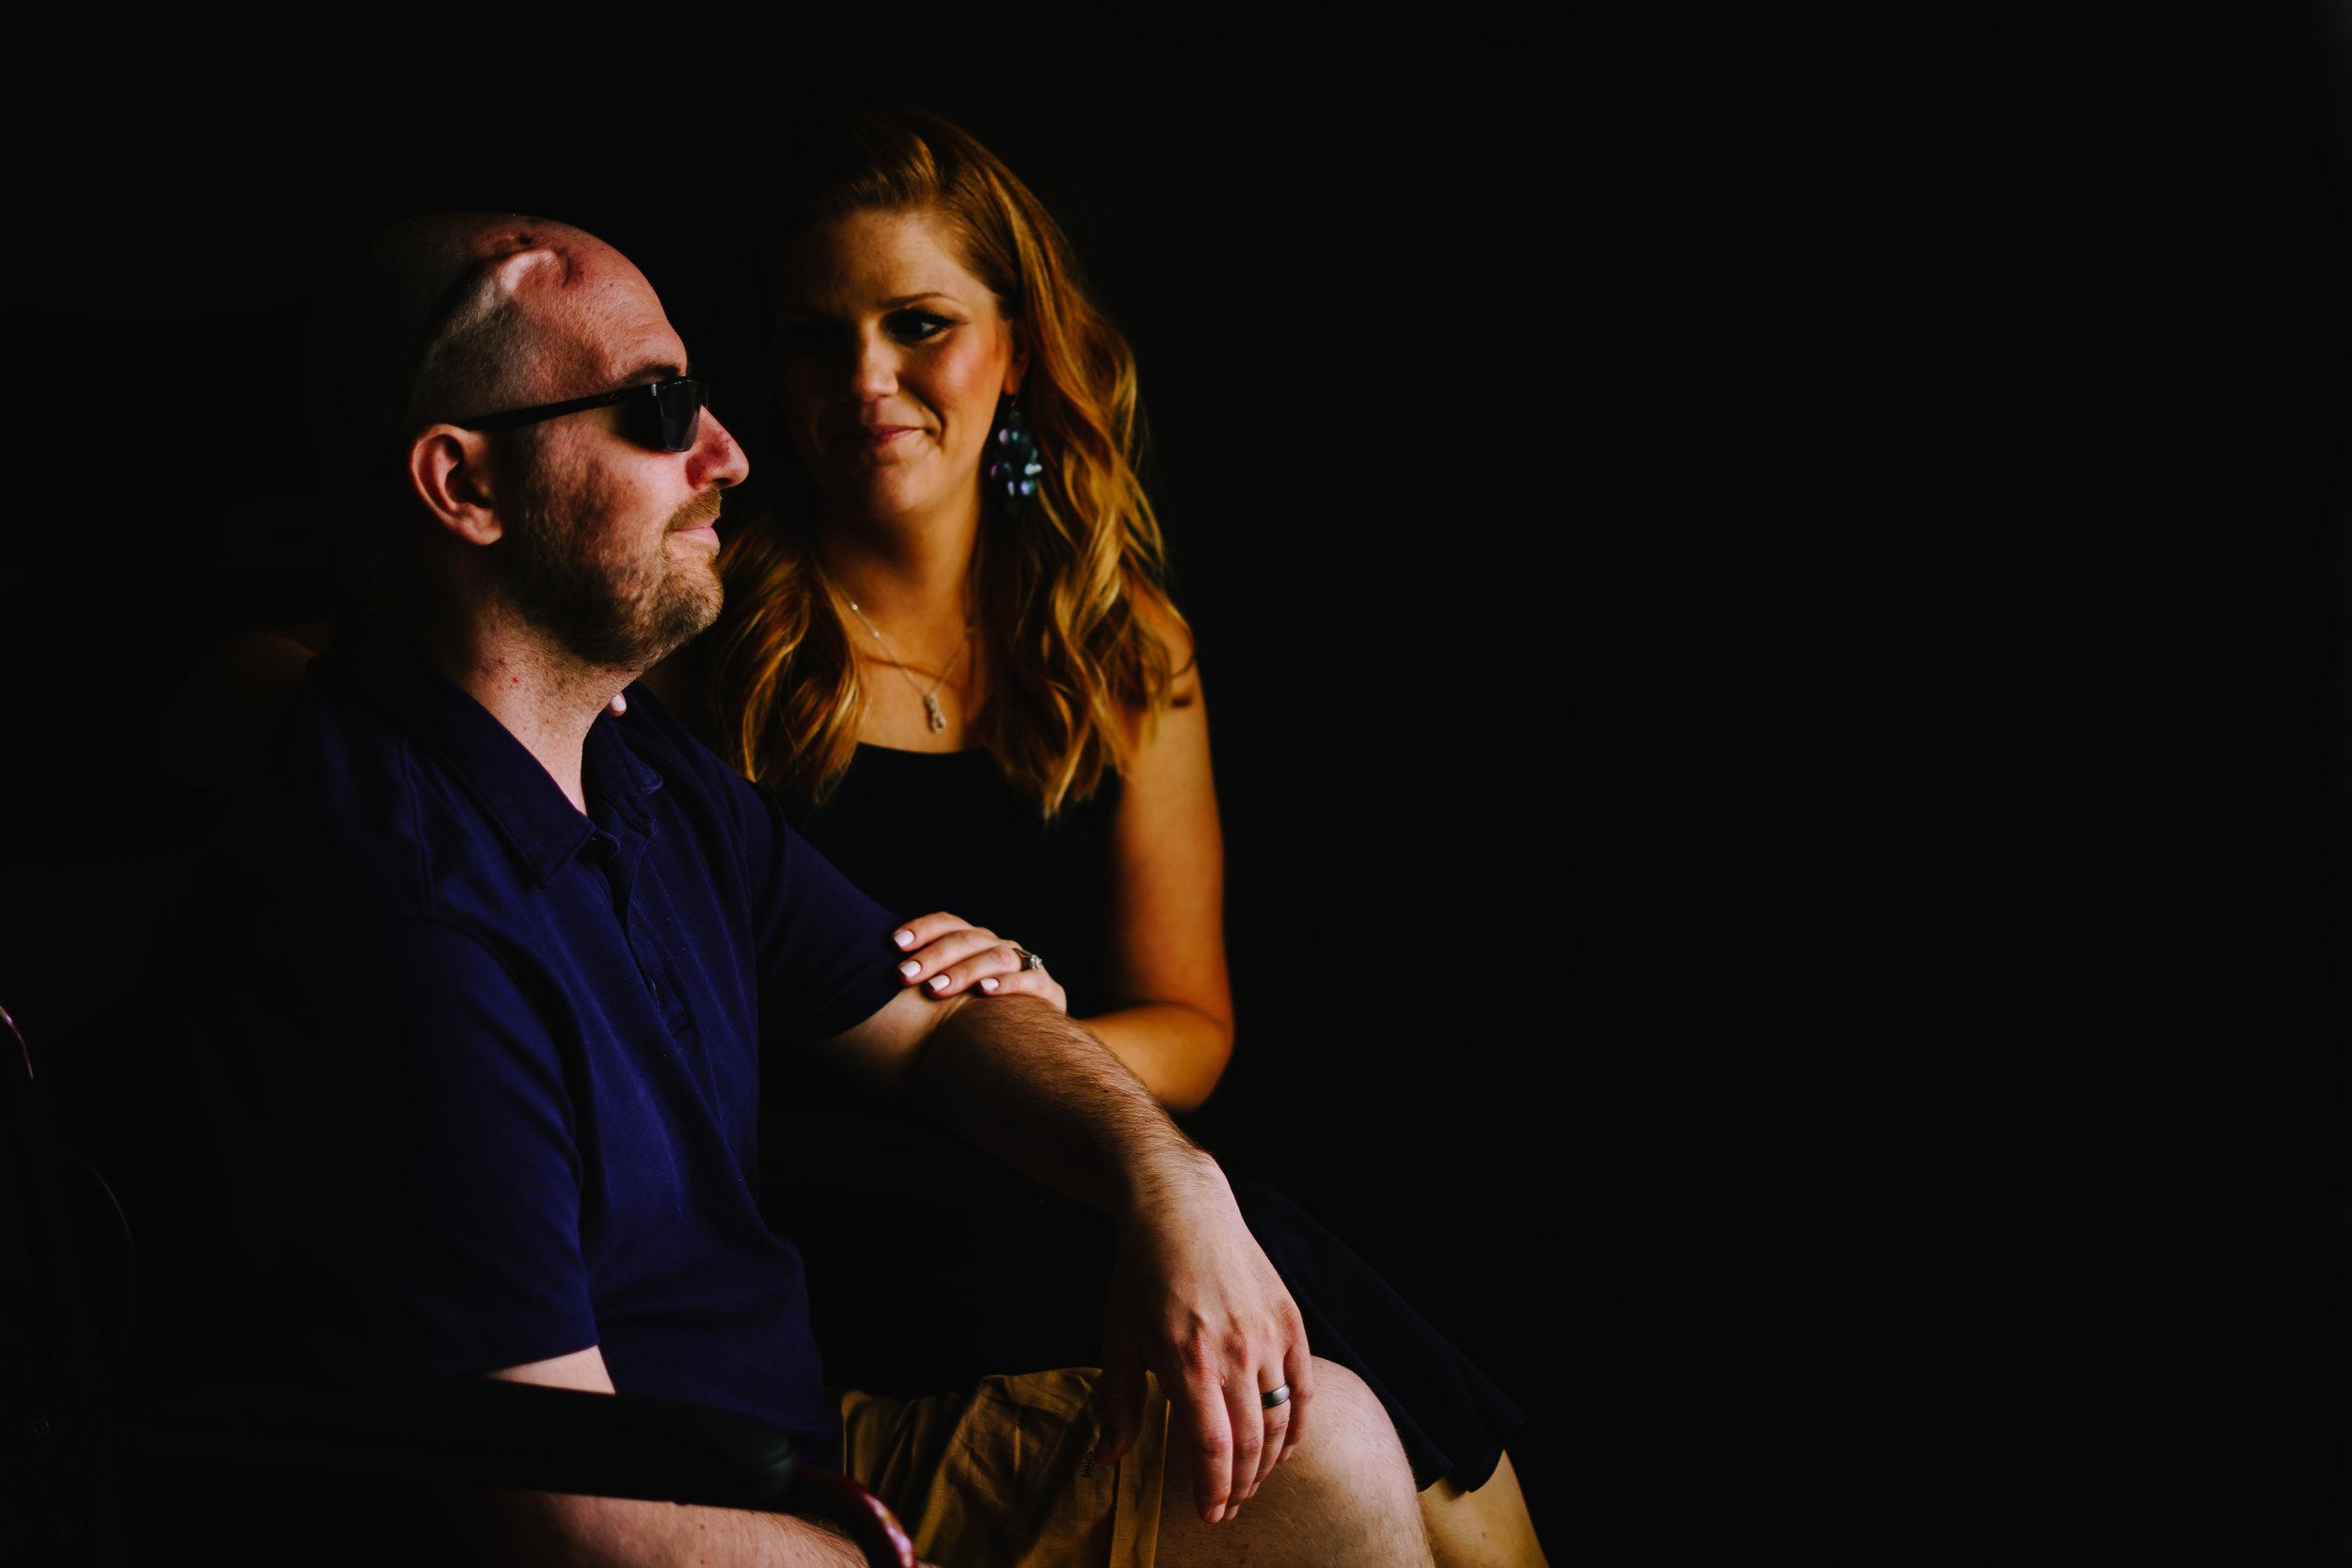 Dan-coghlan-terminally-ill-photographs-brain-cancer31.jpg